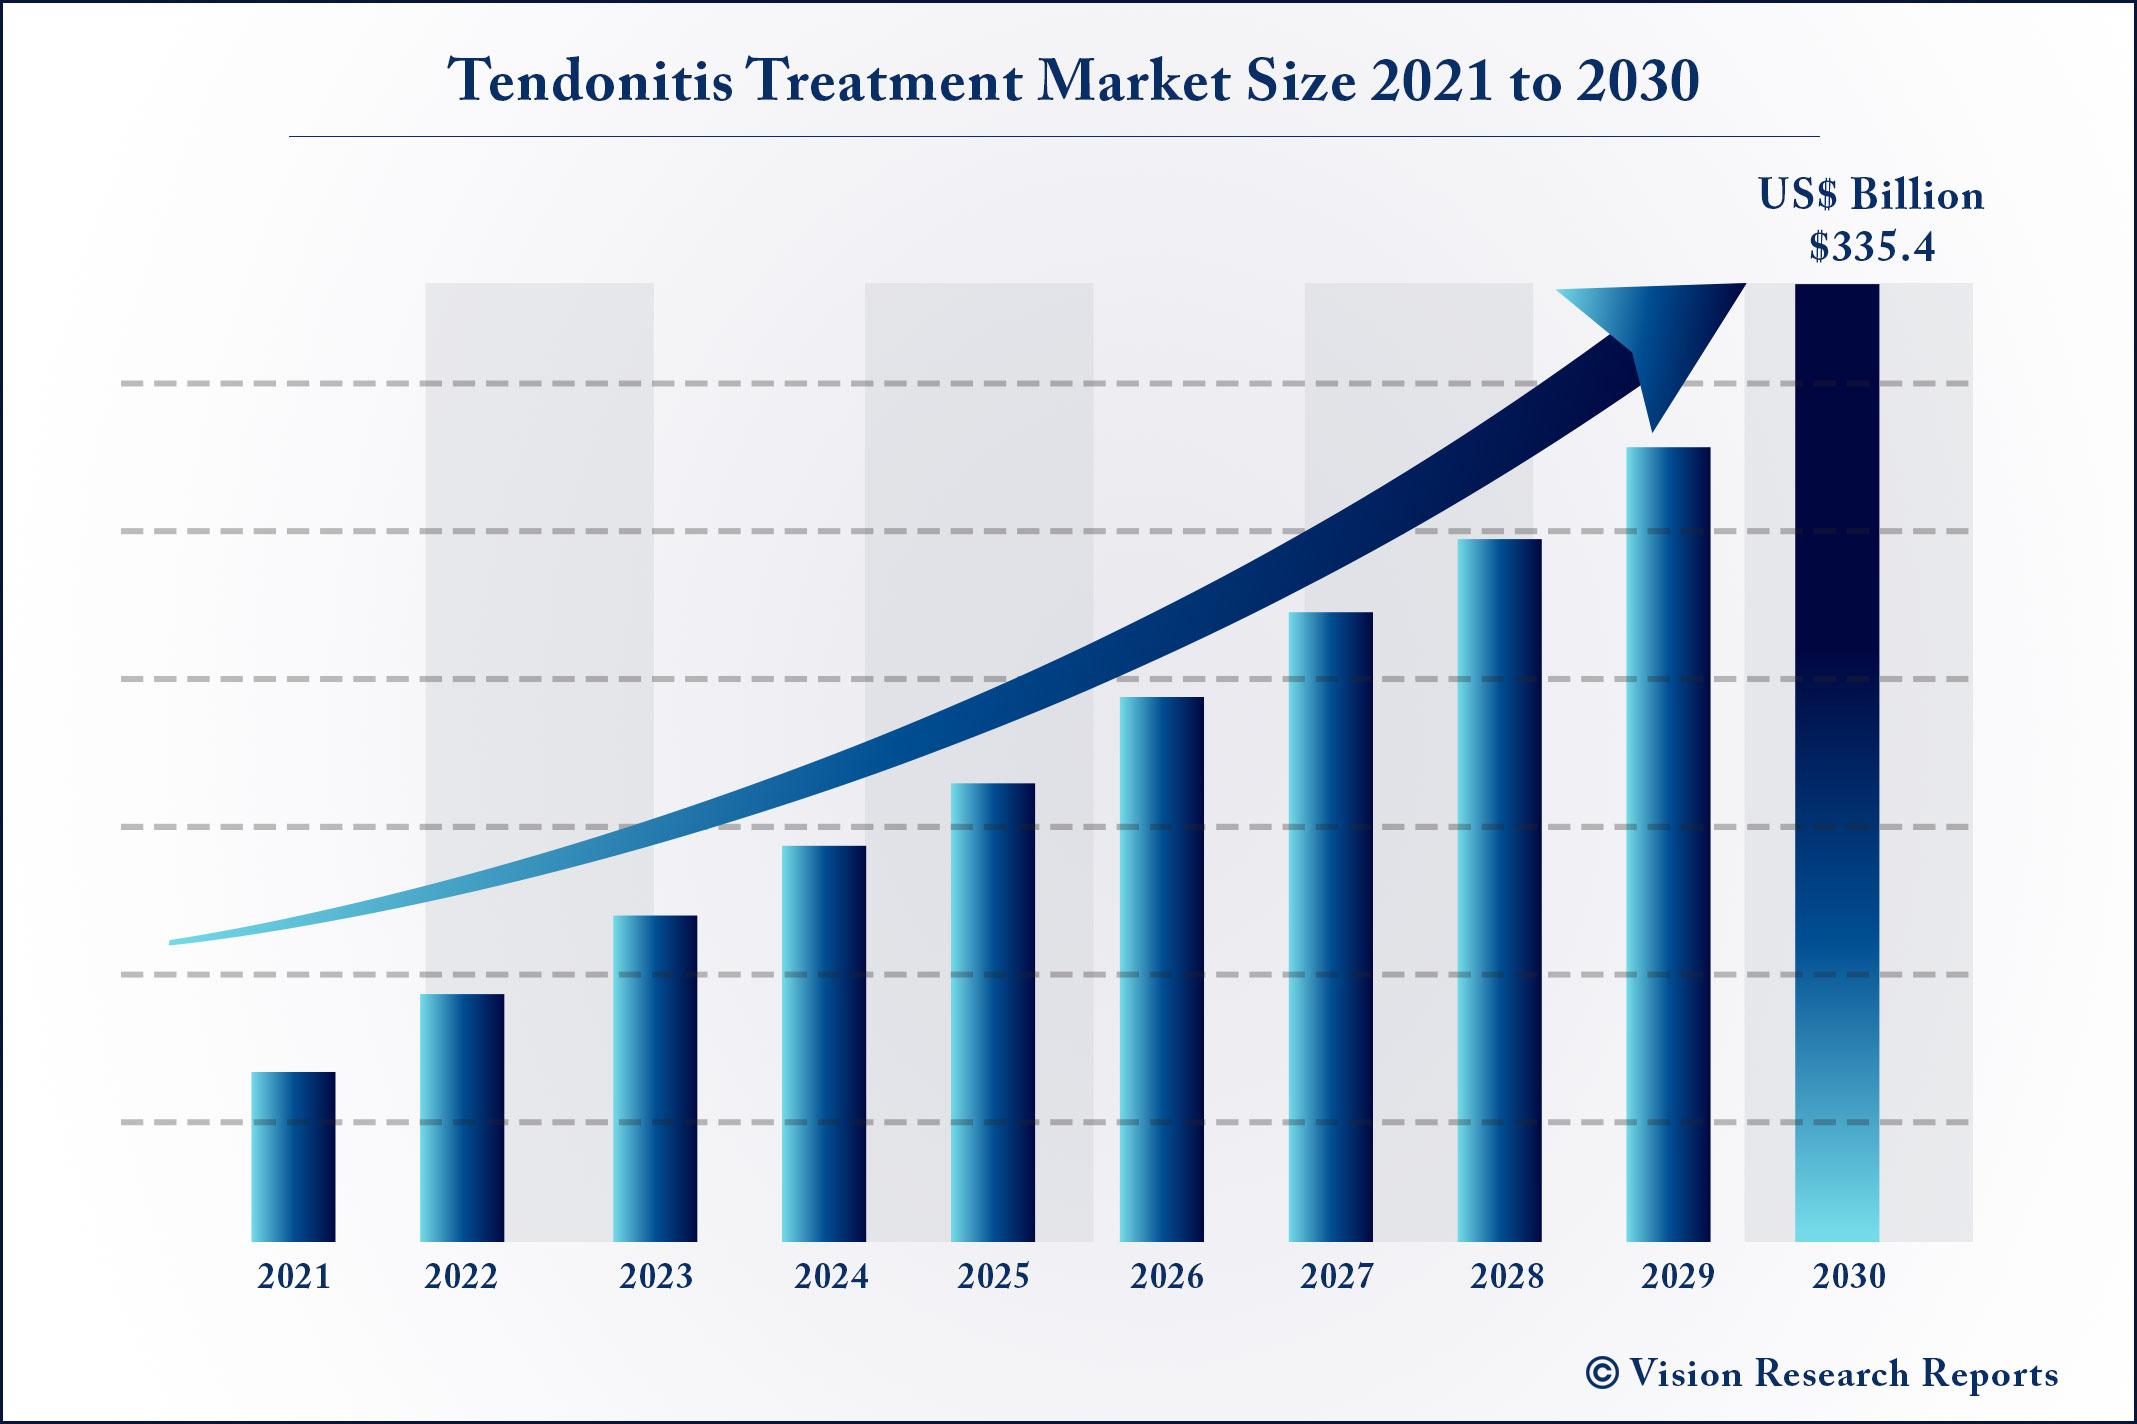 Tendonitis Treatment Market Size 2021 to 2030